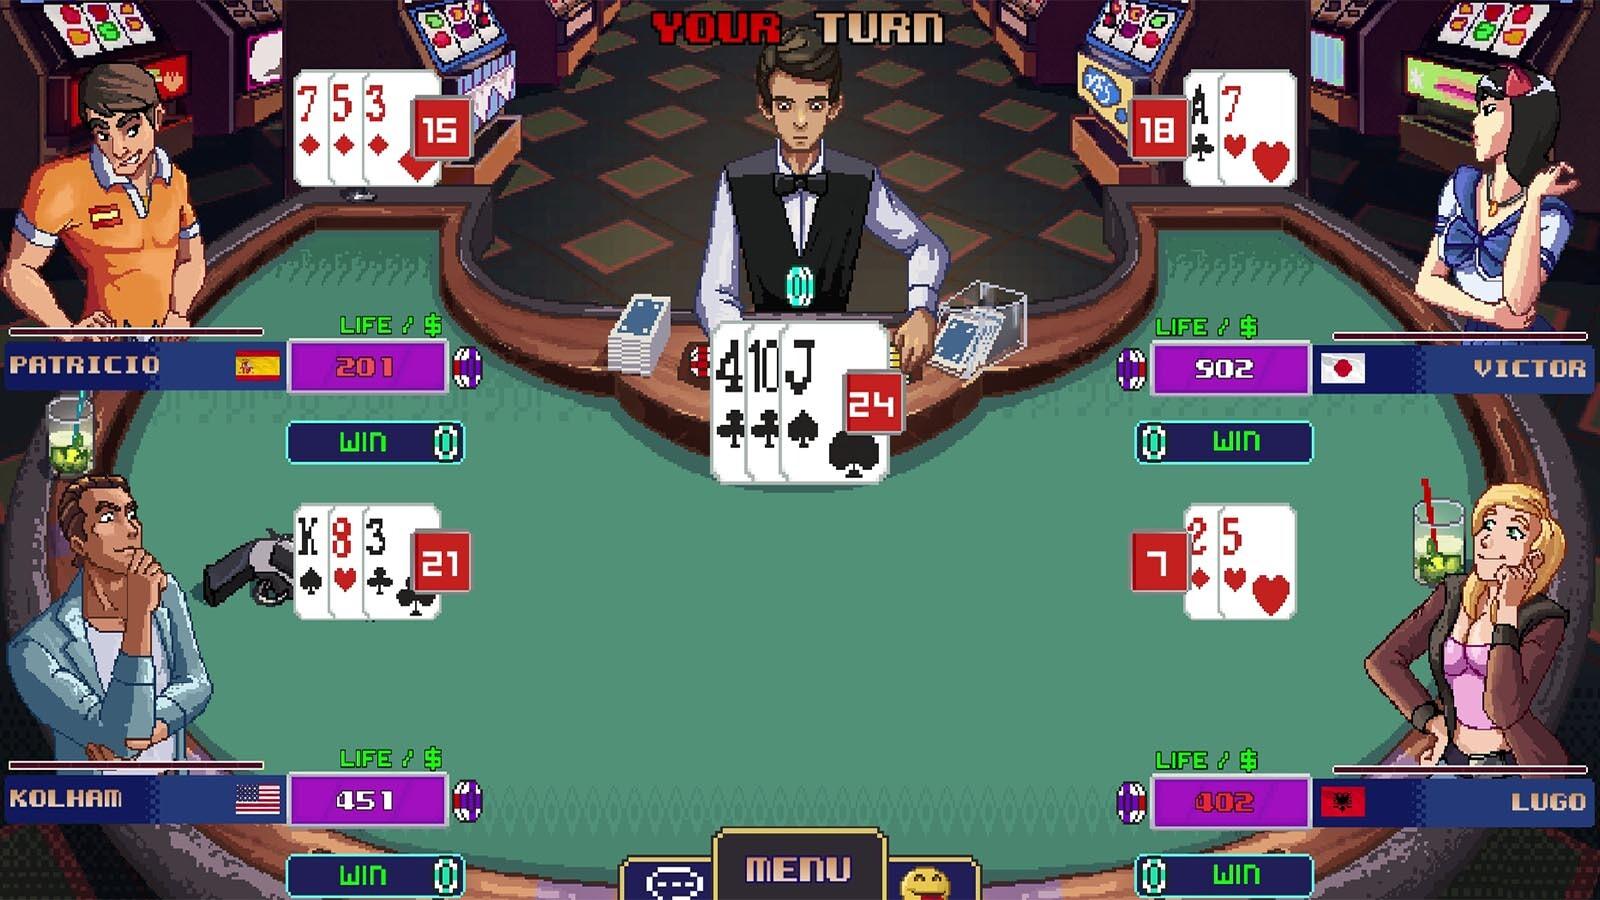 Captain spin casino